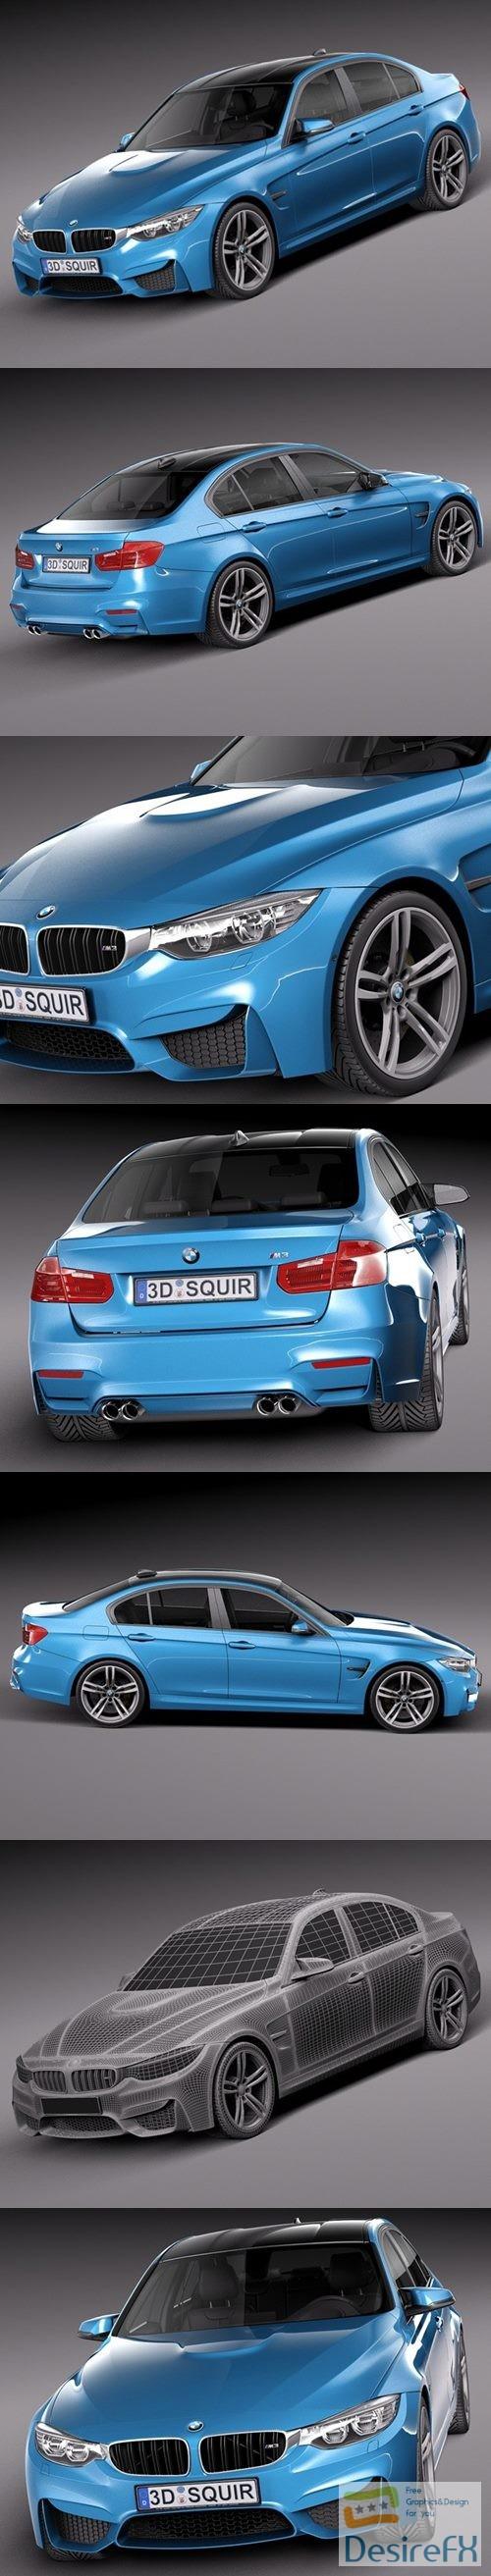 3d-models - BMW M3 F30 Sedan 2015 3D Model